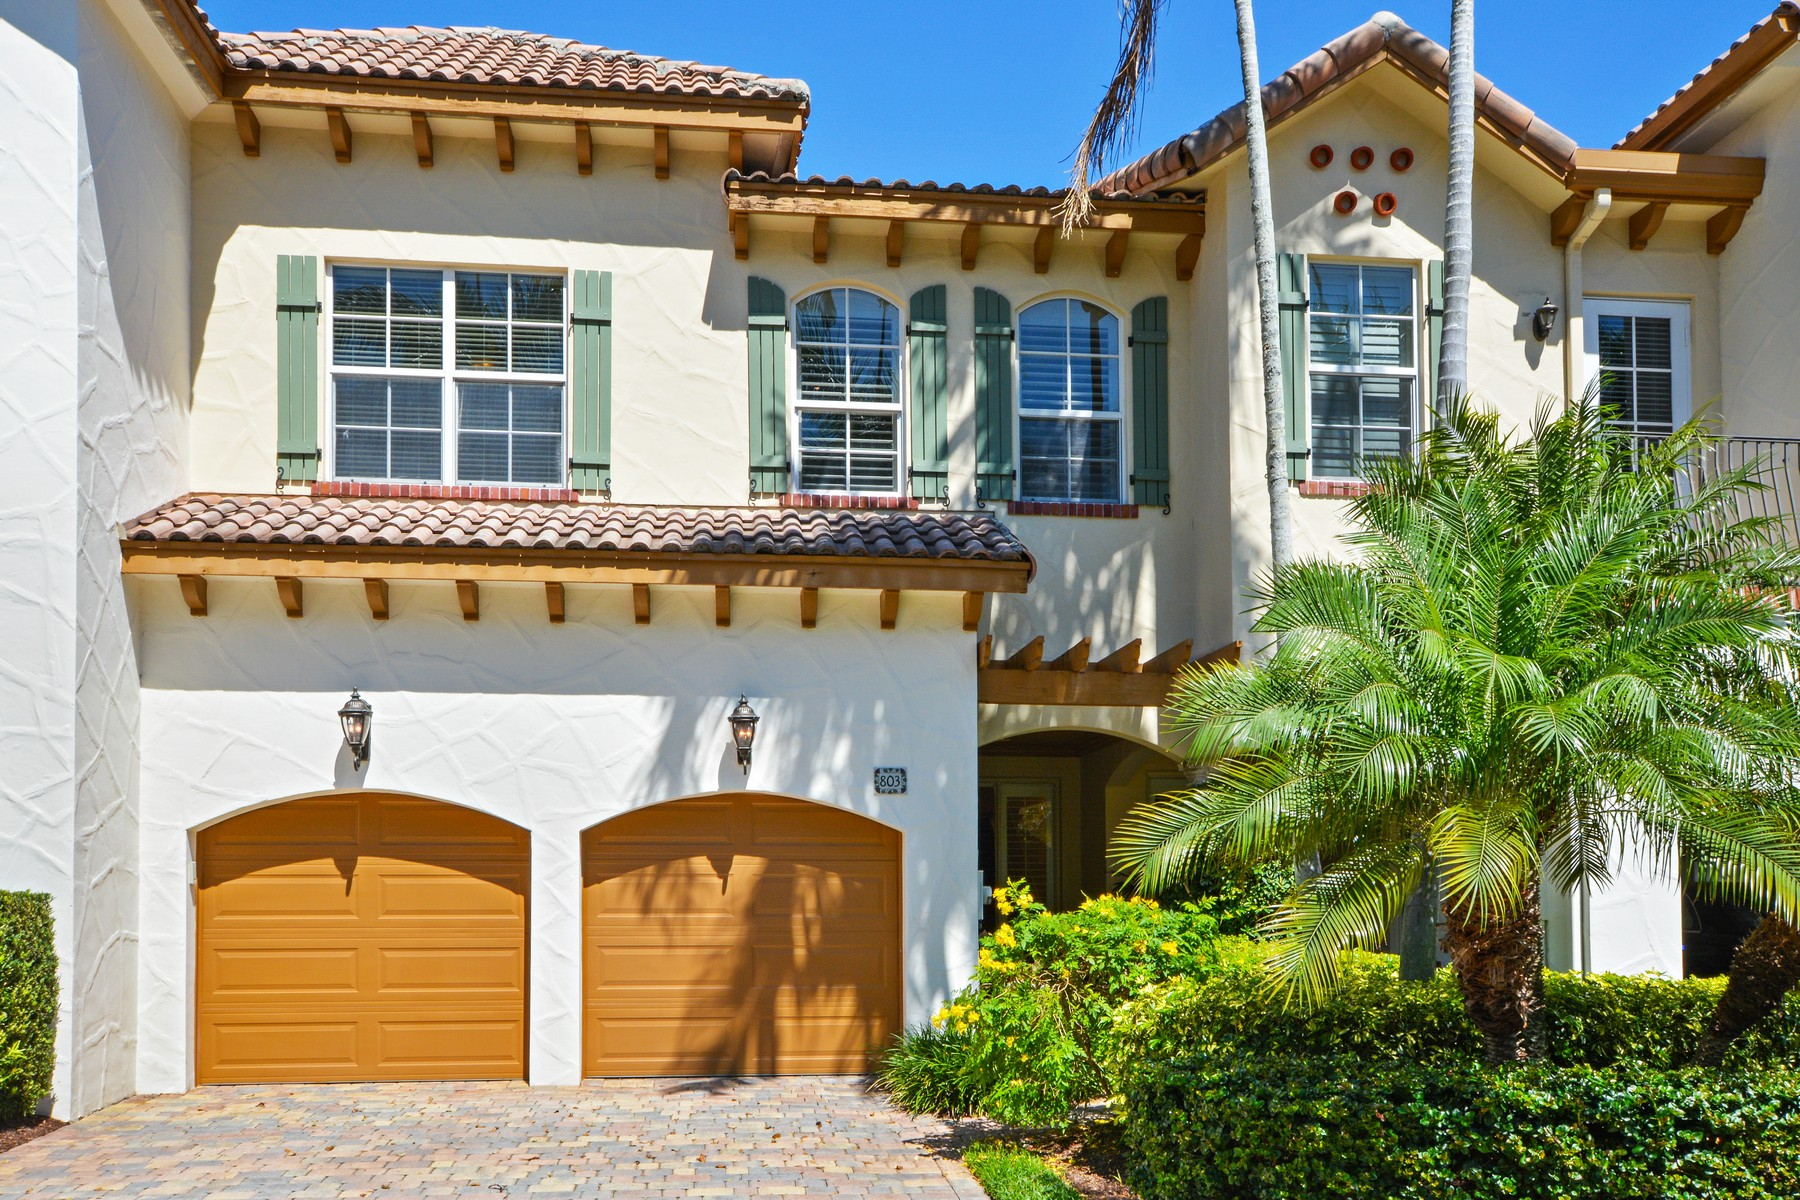 Casa unifamiliar adosada (Townhouse) por un Venta en 803 Estuary Way , Delray Beach, FL 33483 803 Estuary Way Delray Beach, Florida, 33483 Estados Unidos